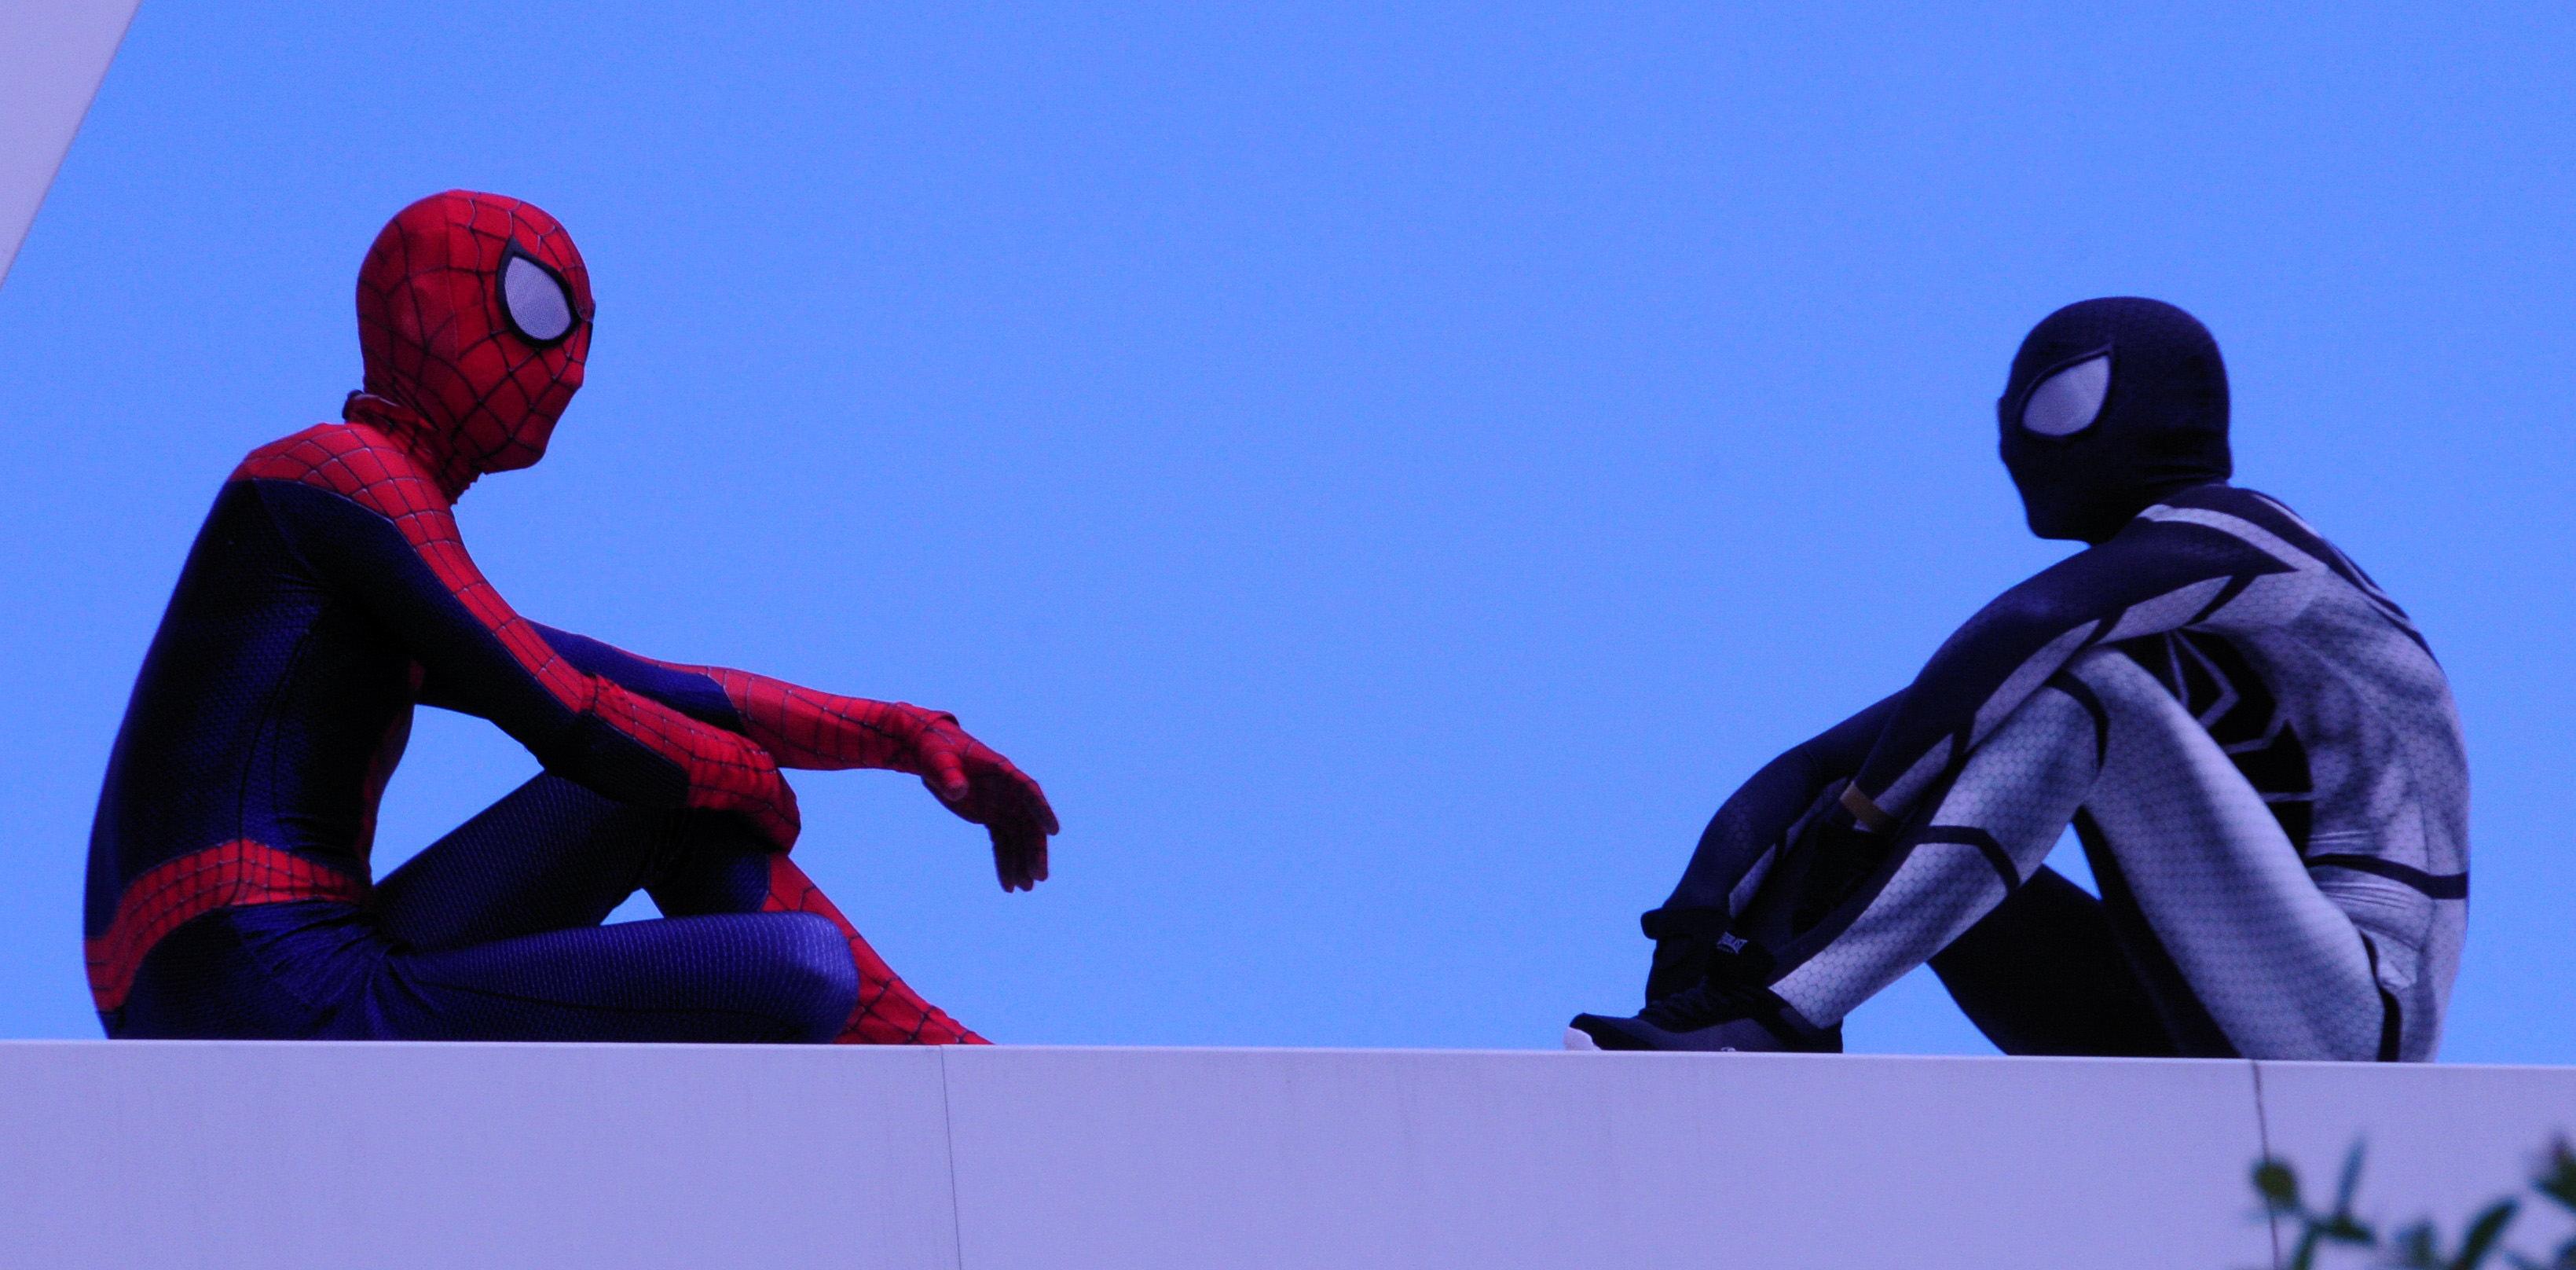 Spiderman Cosplay Baltimore Comic Con BCC